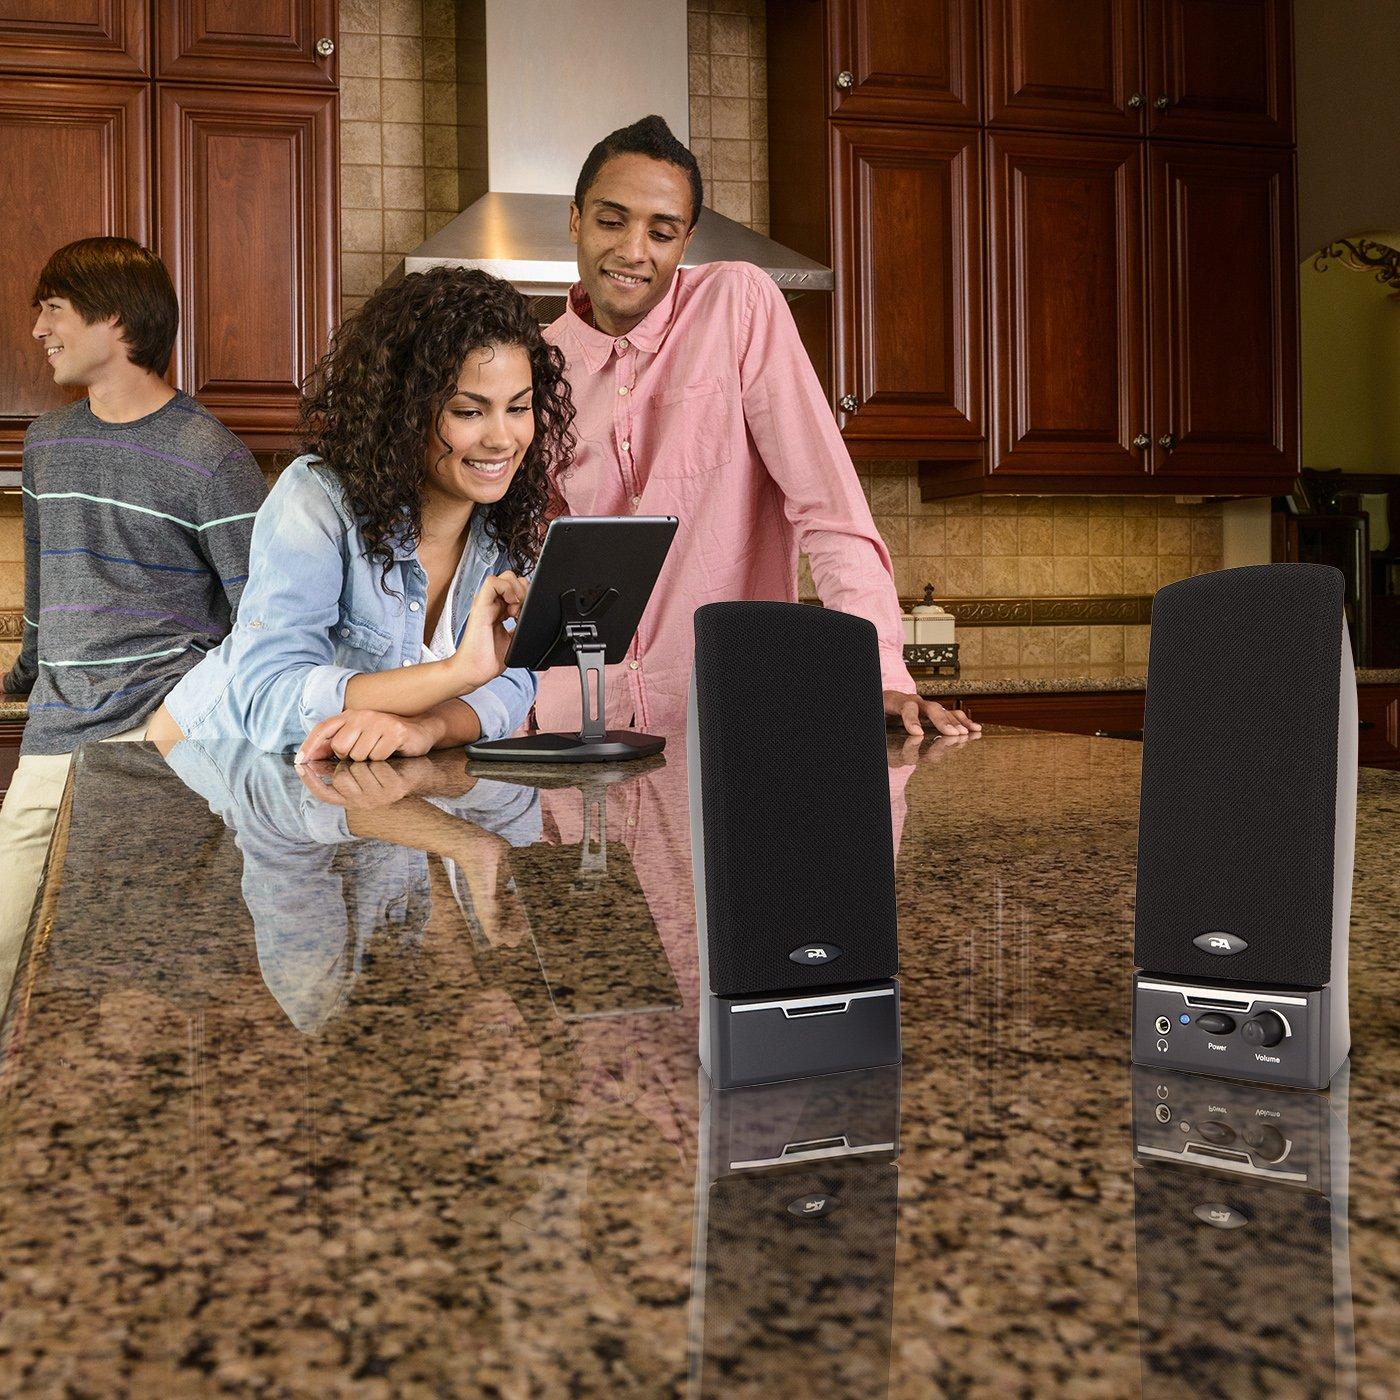 Cyber Acoustics CA-2014 multimedia desktop computer speakers by Cyber Acoustics (Image #6)